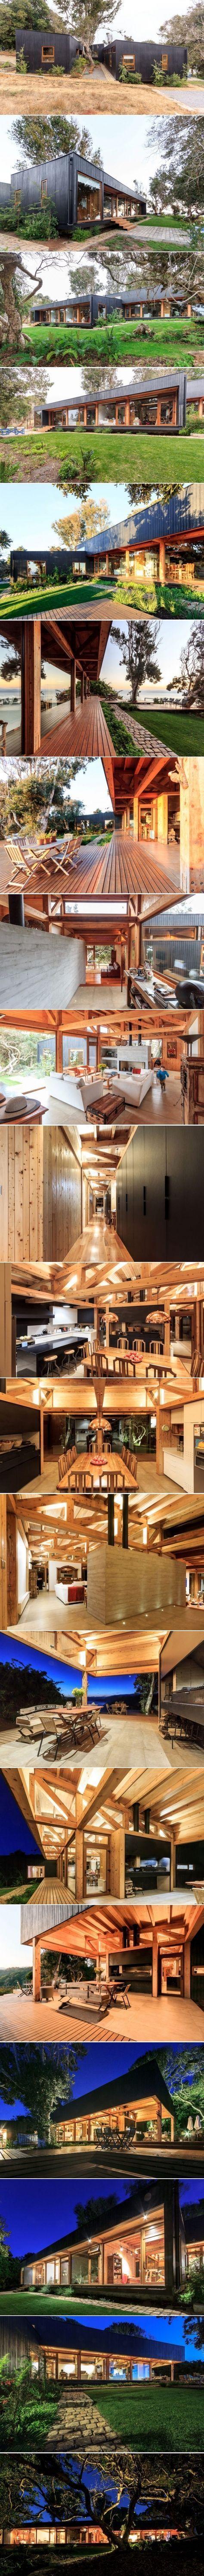 Prado Arquitectos Designs a Cozy Home in Hualpén, Chile   HomeDSGN #ContainerHomeDesigns